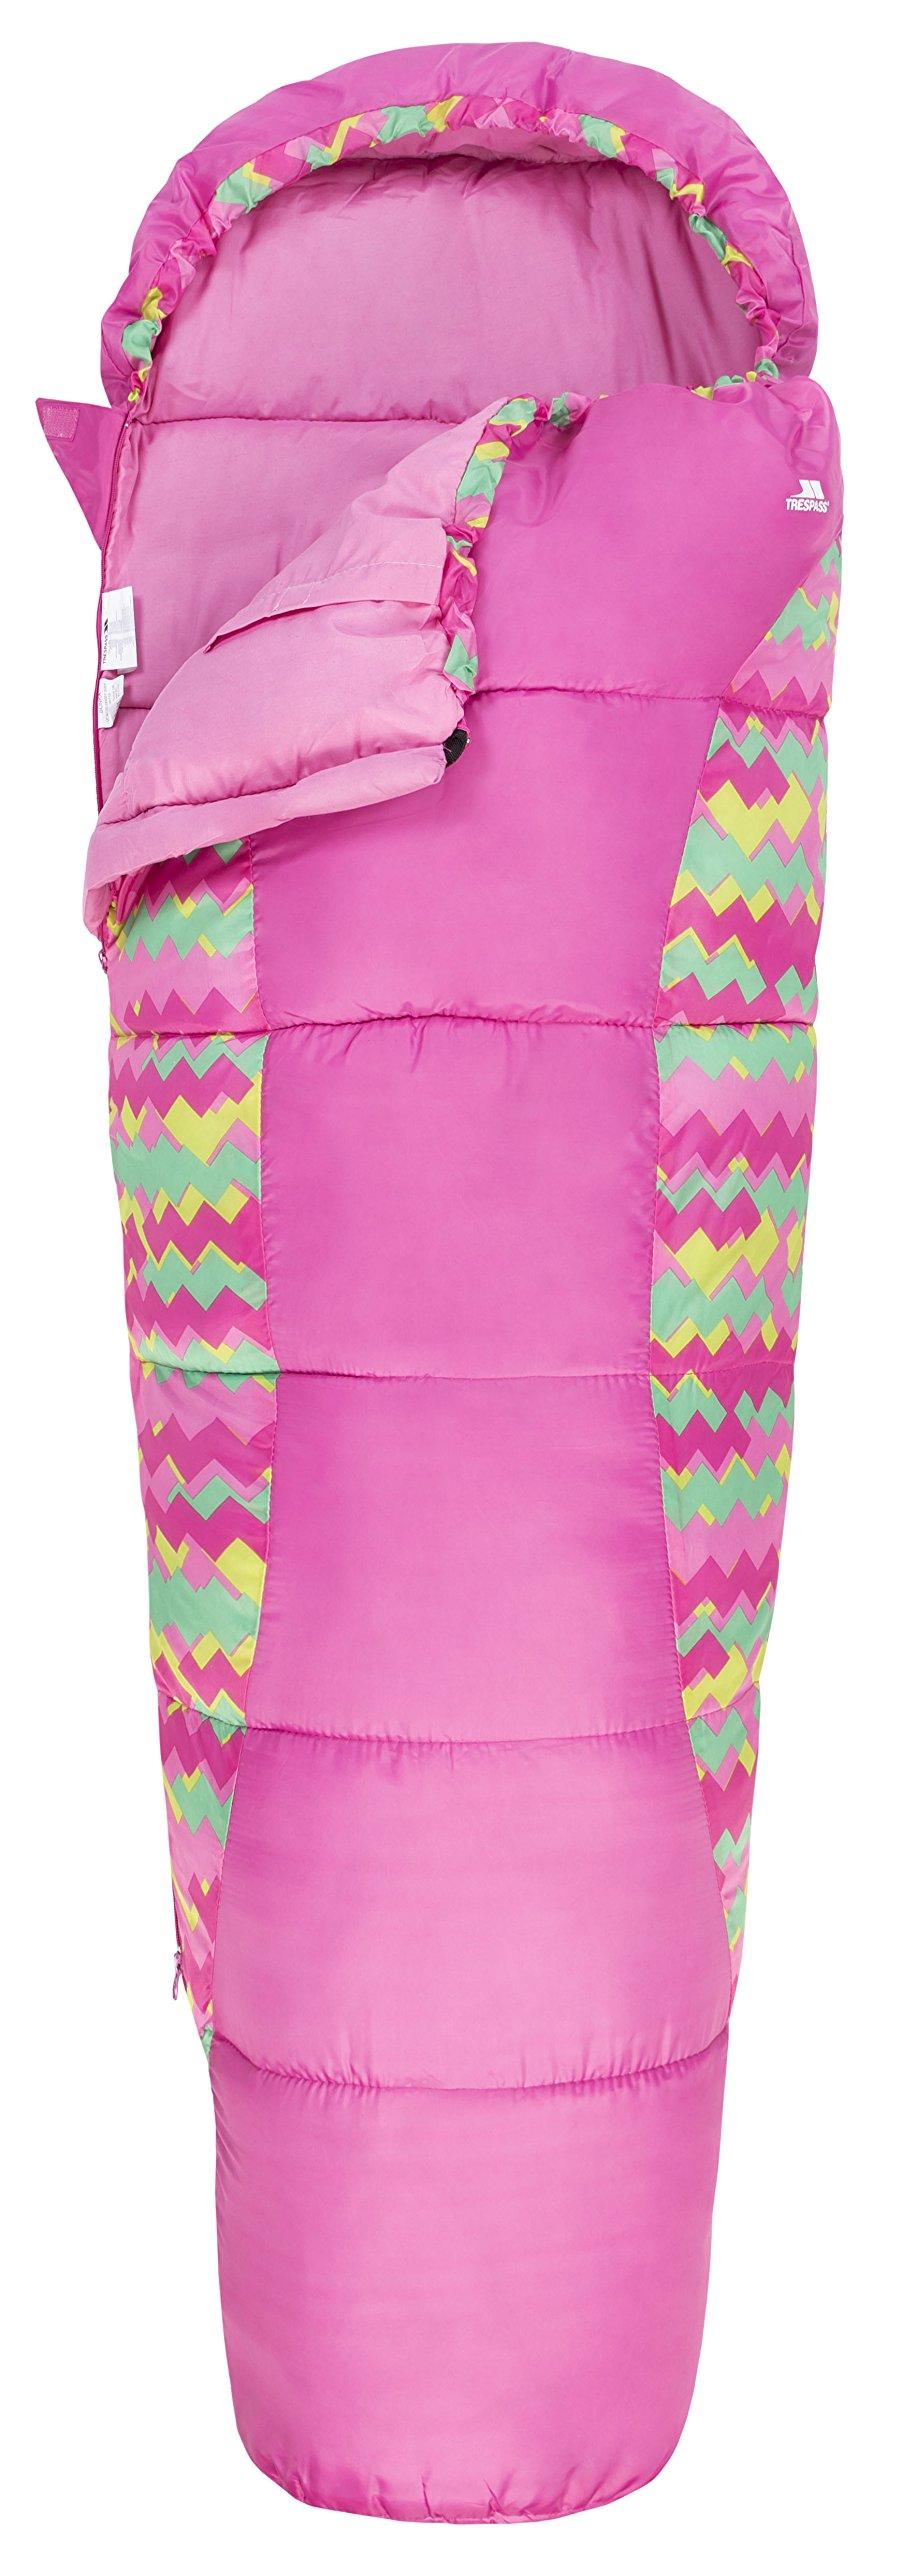 Trespass Unisex Child BUNKA 3 Season Sleeping Bag with Hollow Fibre Filling 3